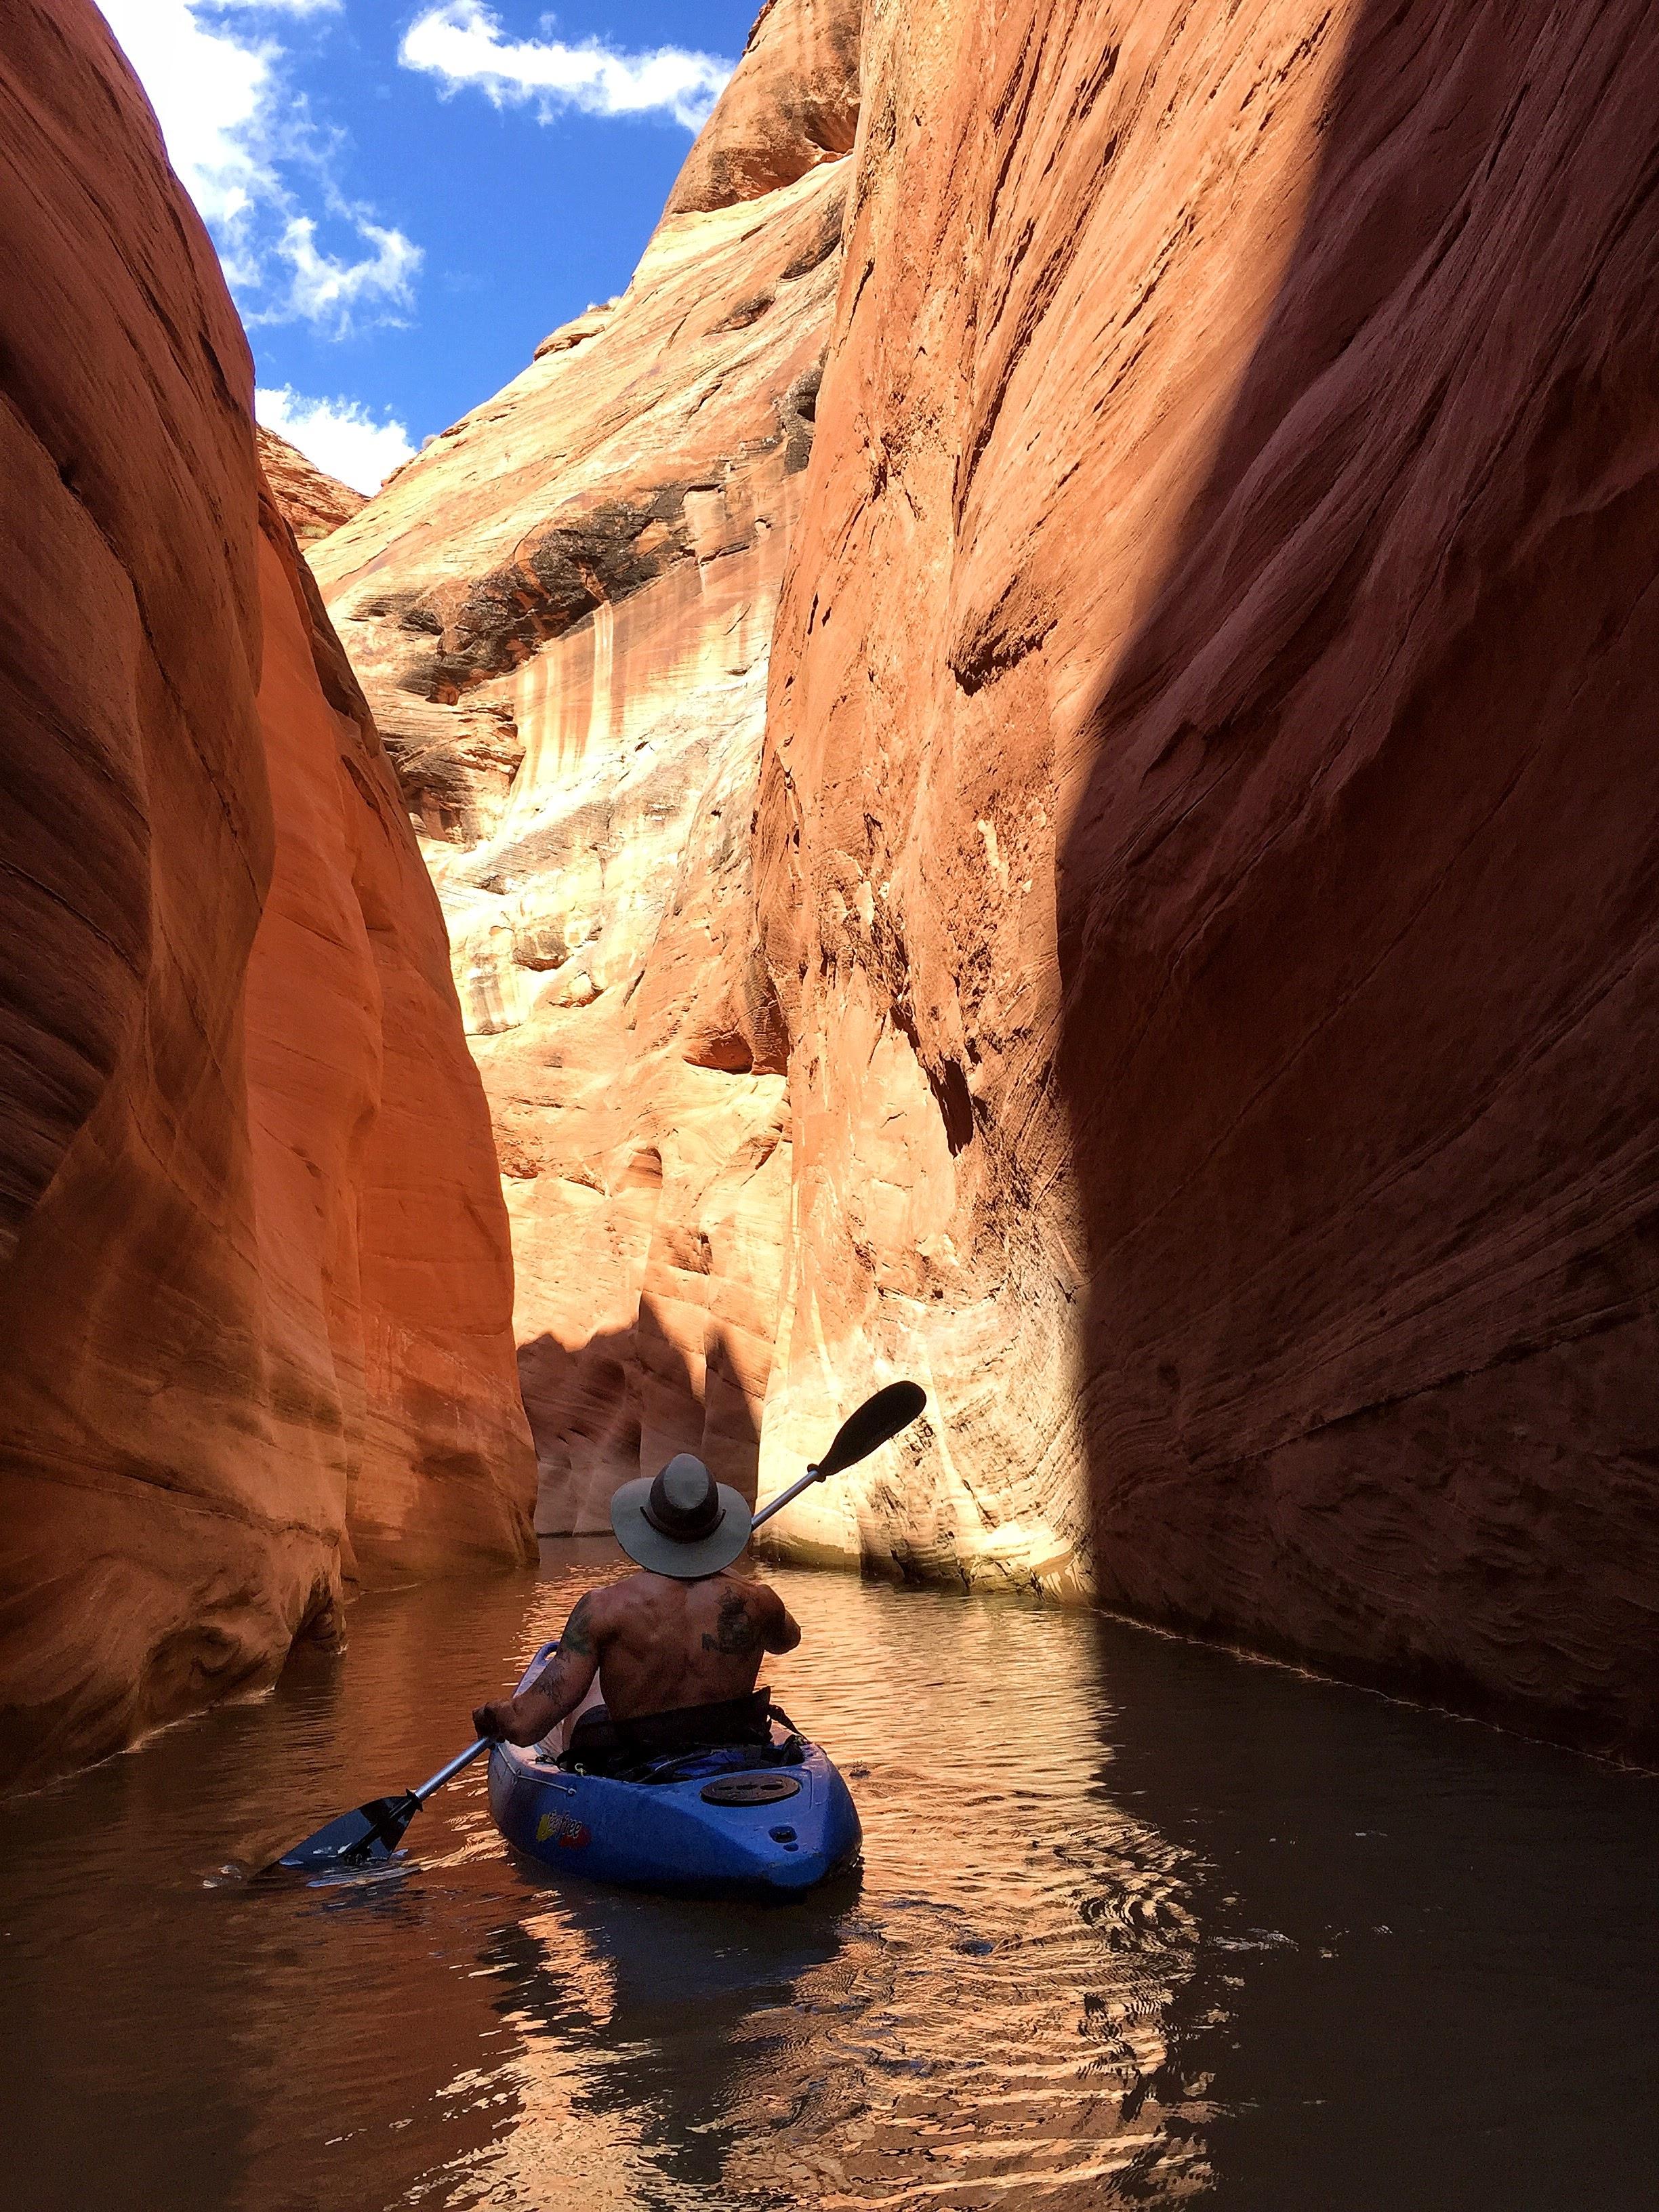 Aaron paddling through a slot canyon in Utah, kayaking in the outdoors - 3 Days*